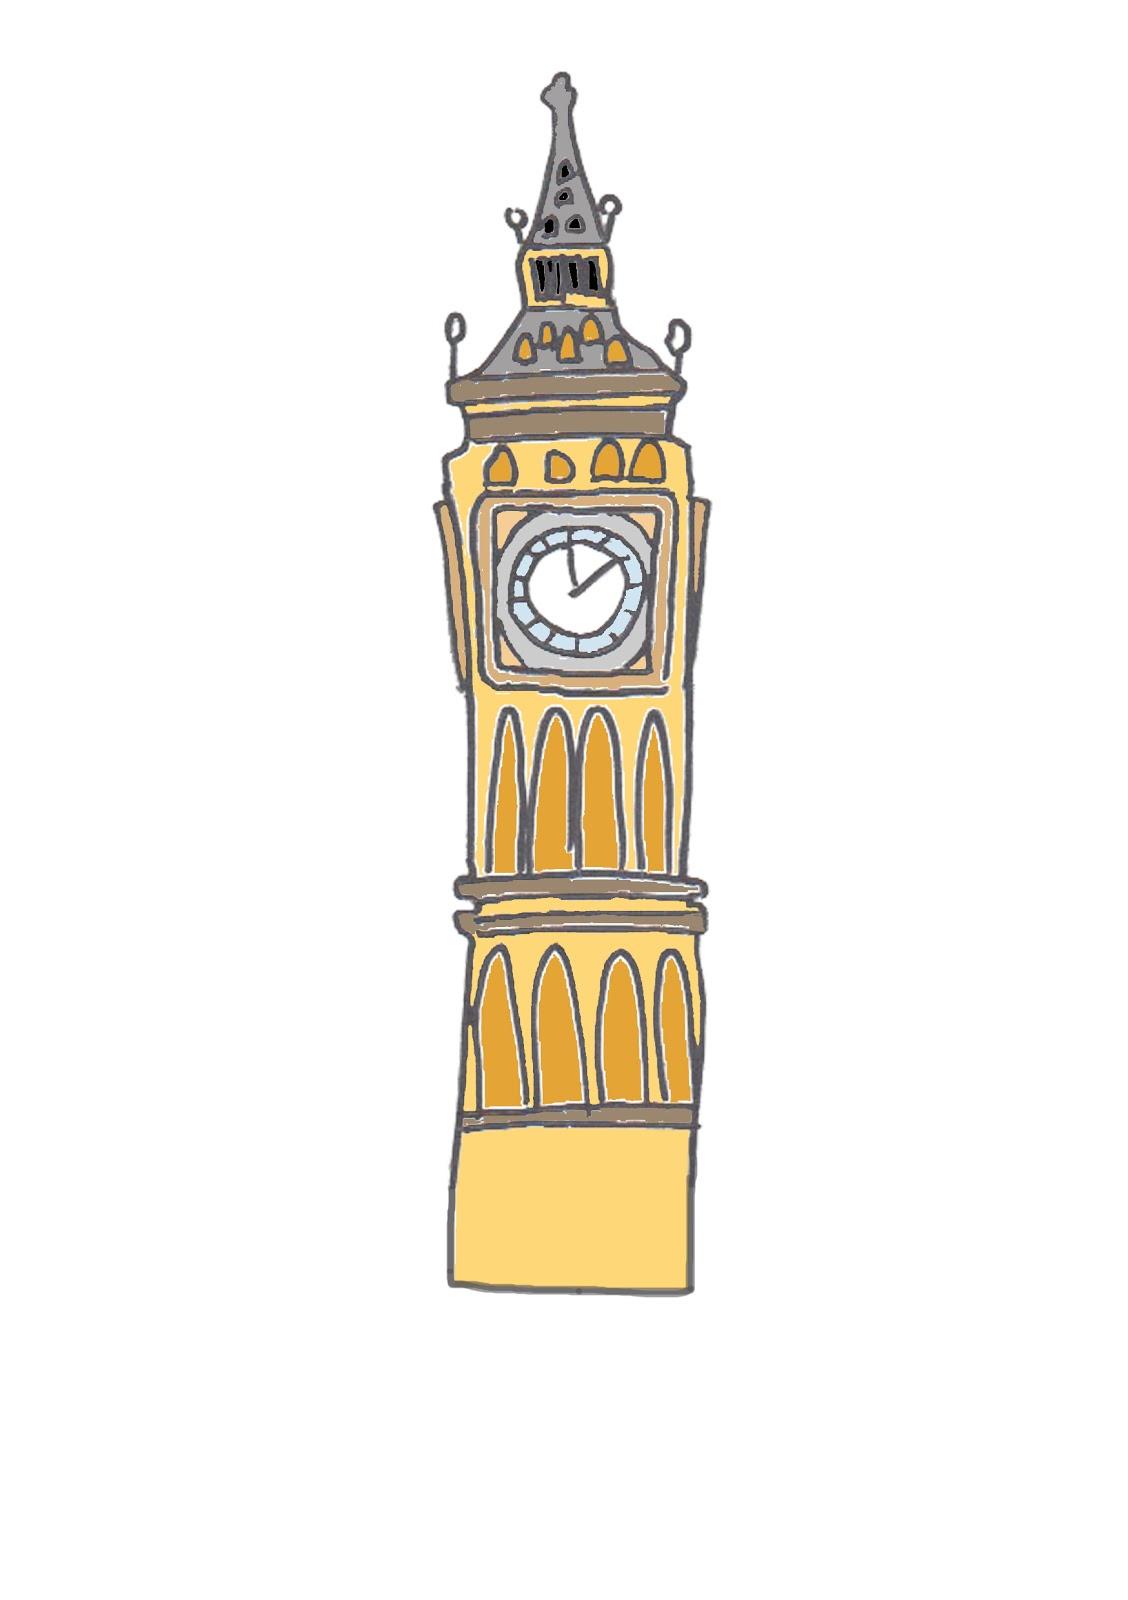 KID CLAYTON: Cities Cartoon Monuments